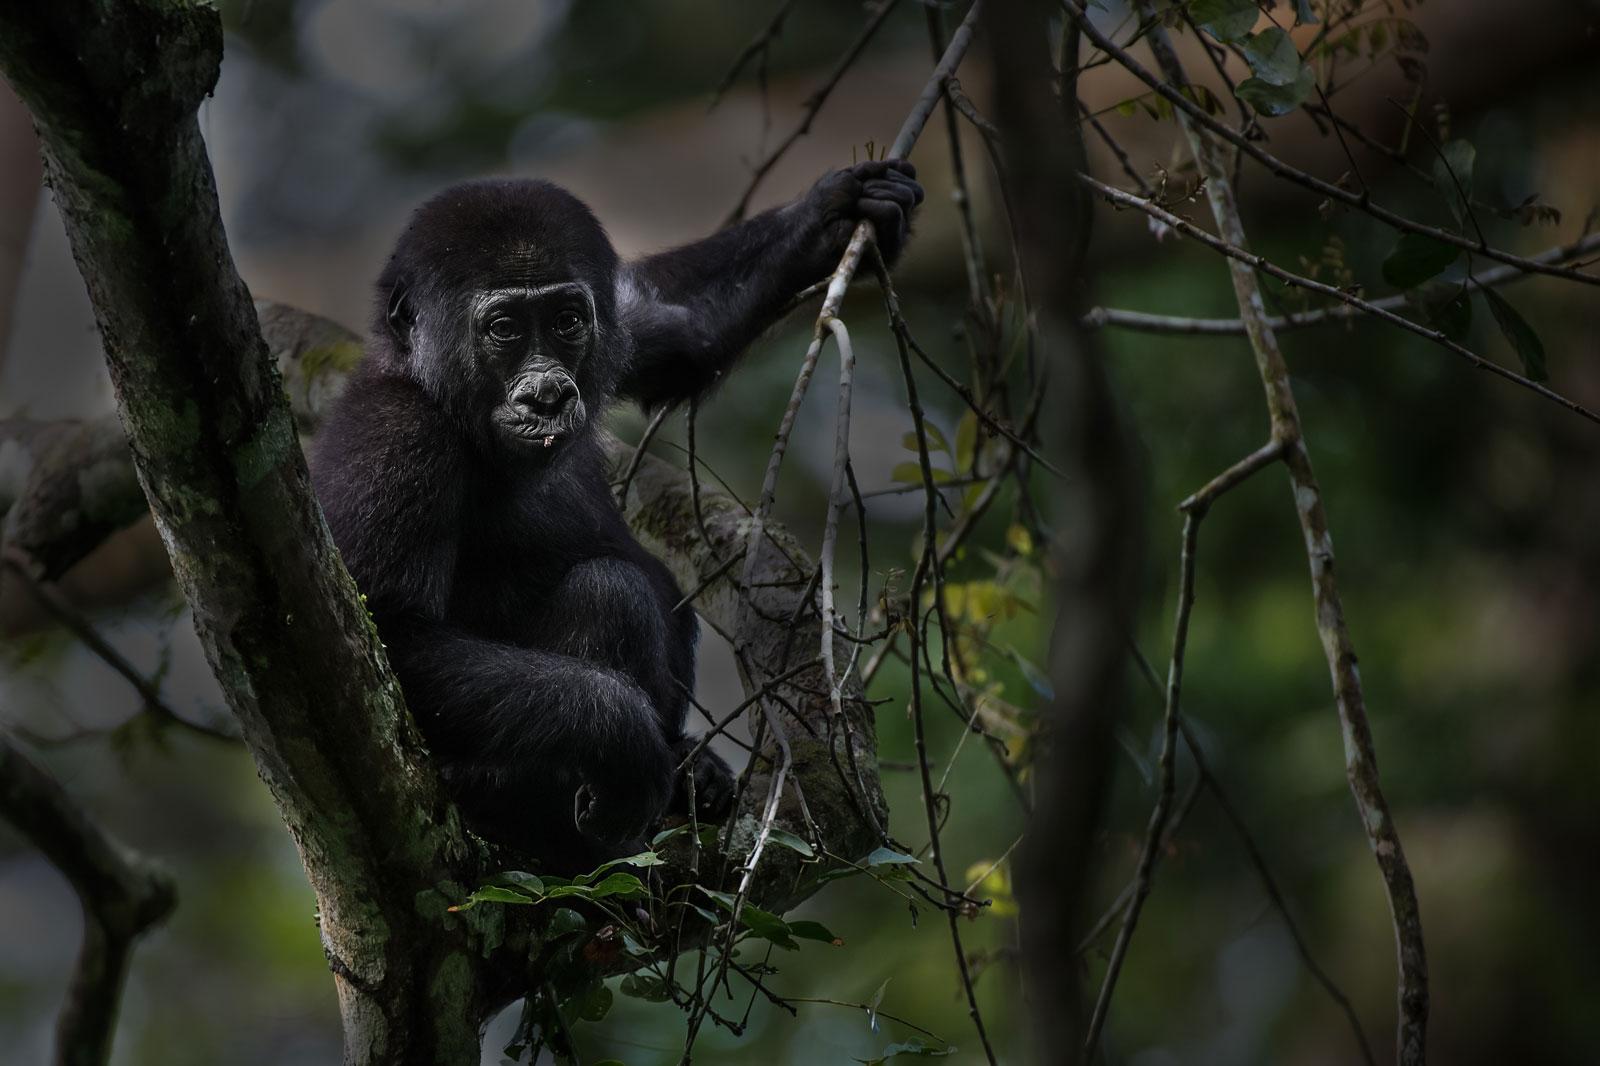 congo-gorillas-3_Michael-Viljoen